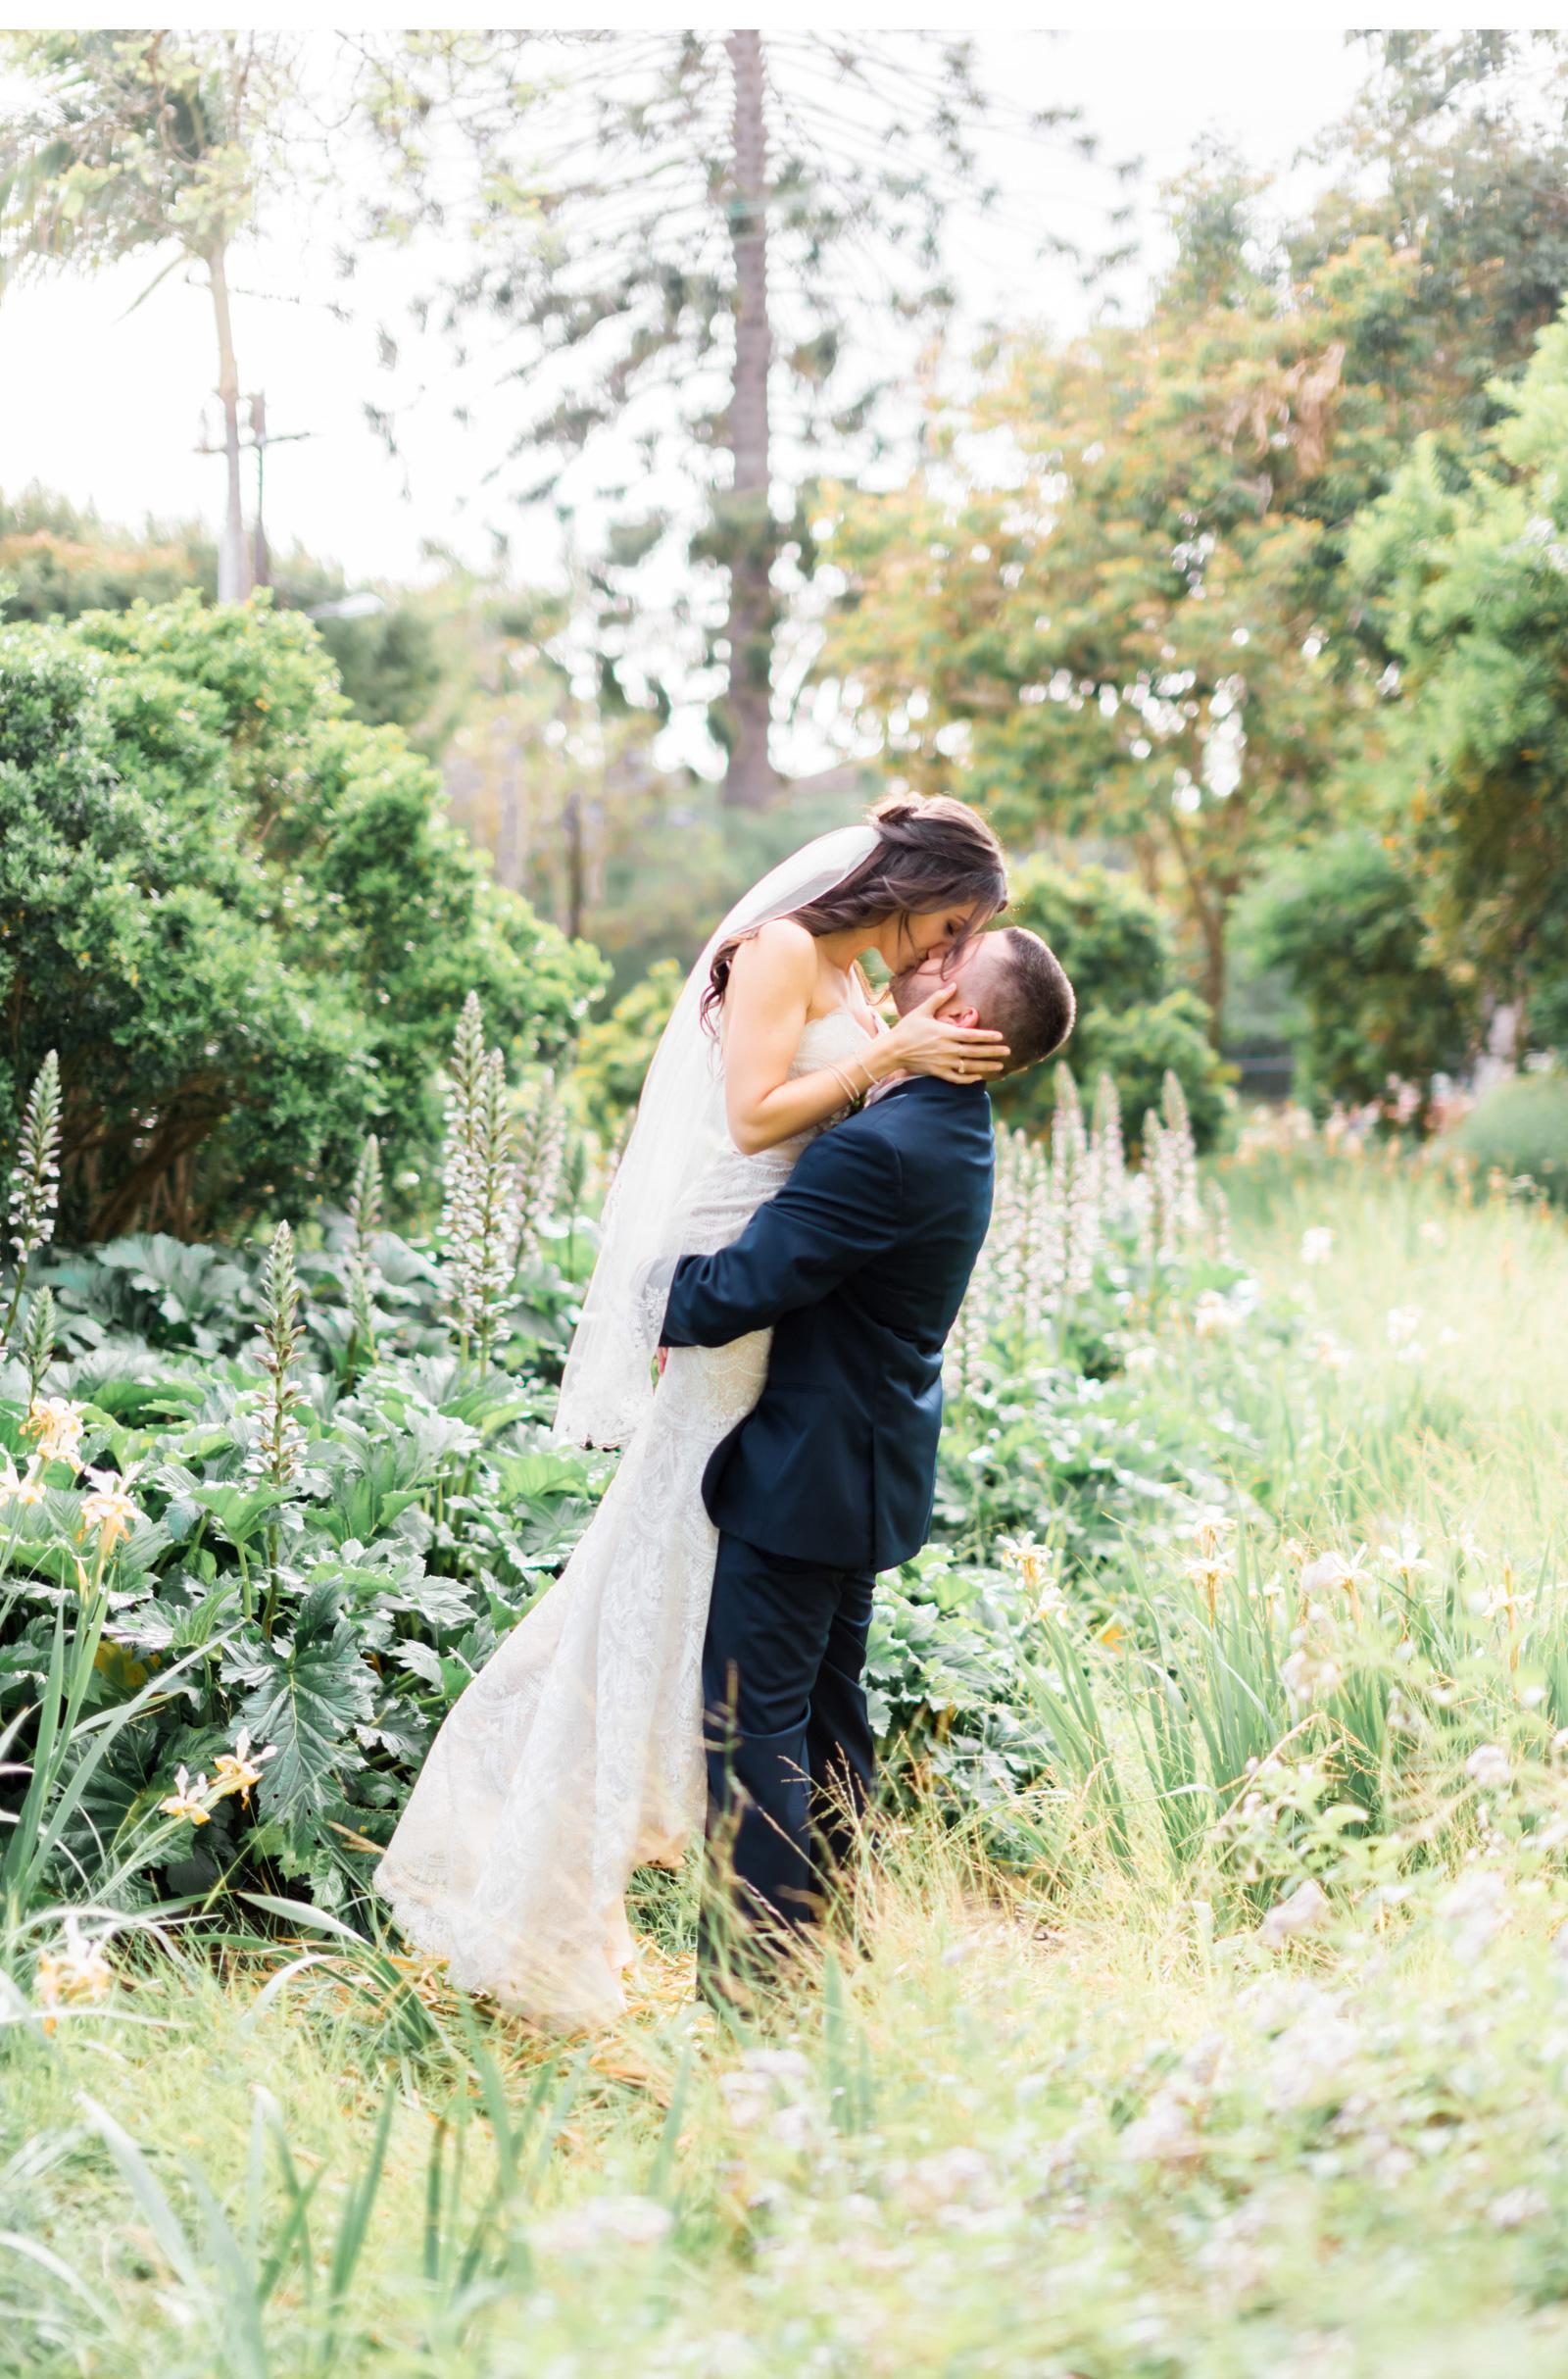 Adventure-Wedding-Photographer-Natalie-Schutt-Photography_09.jpg